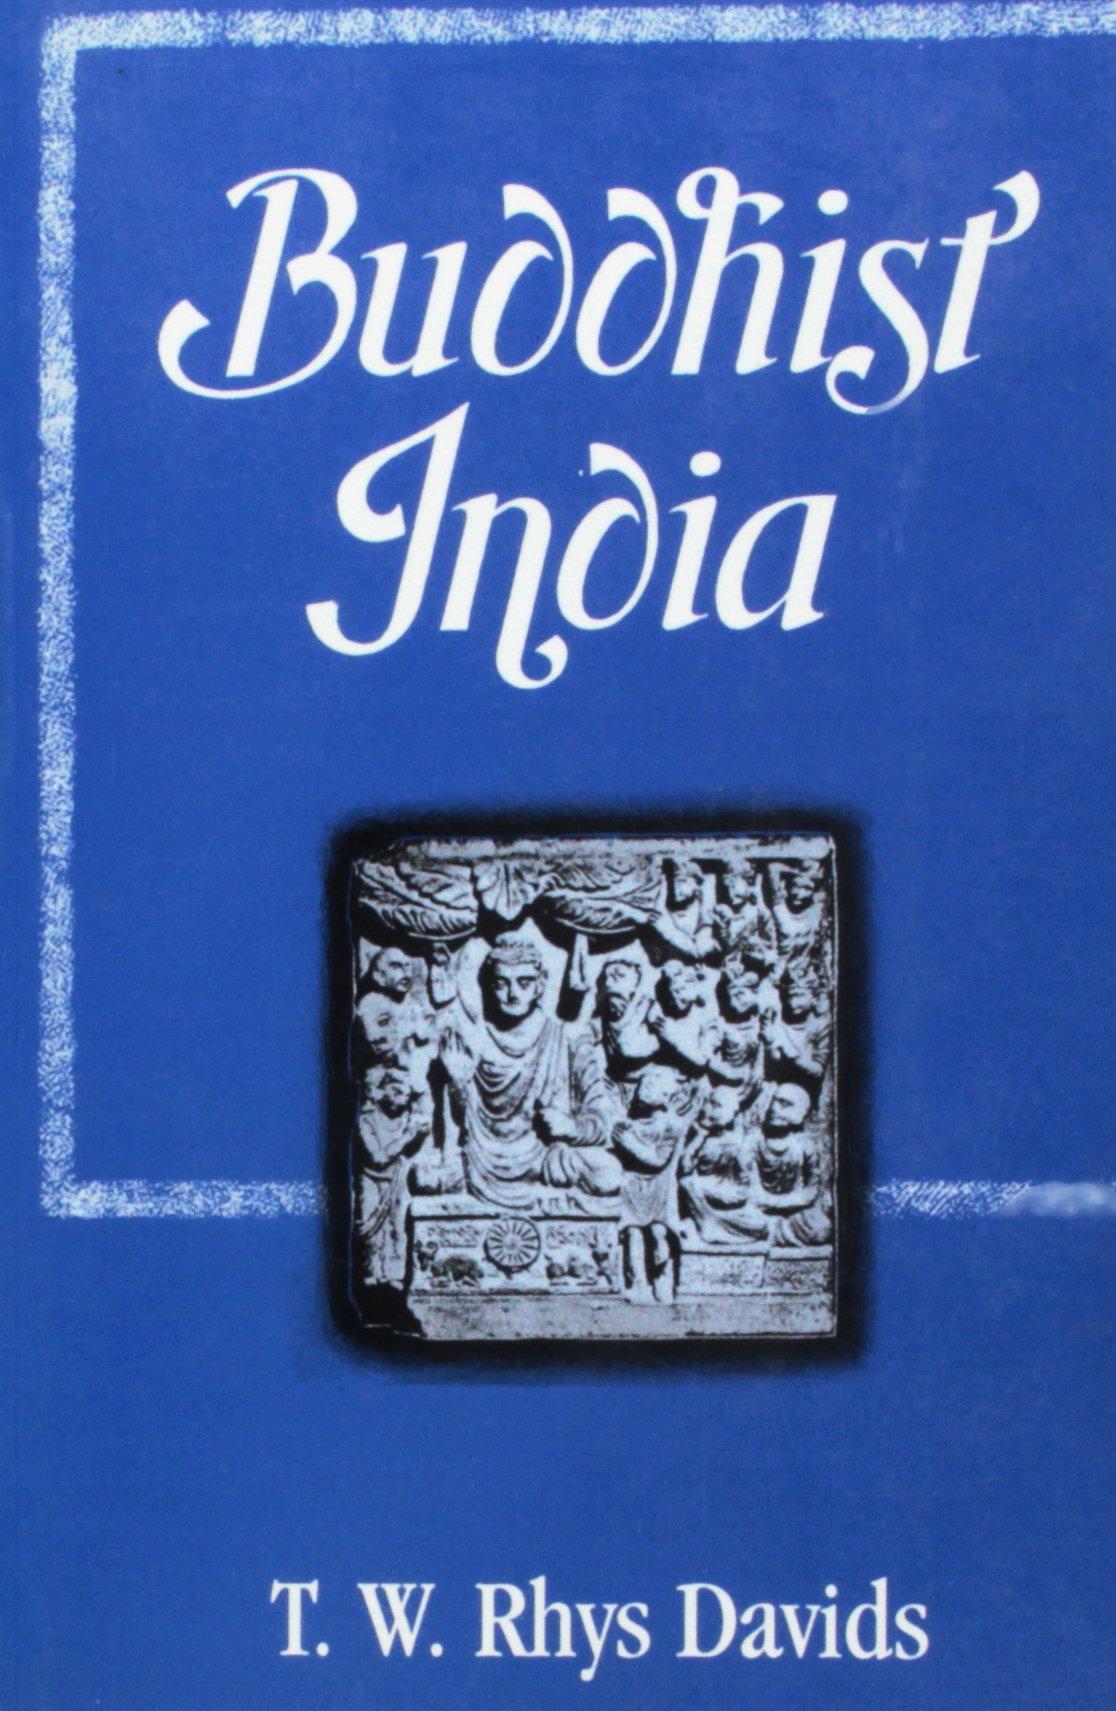 Rhys Davids Buddhist India cover art